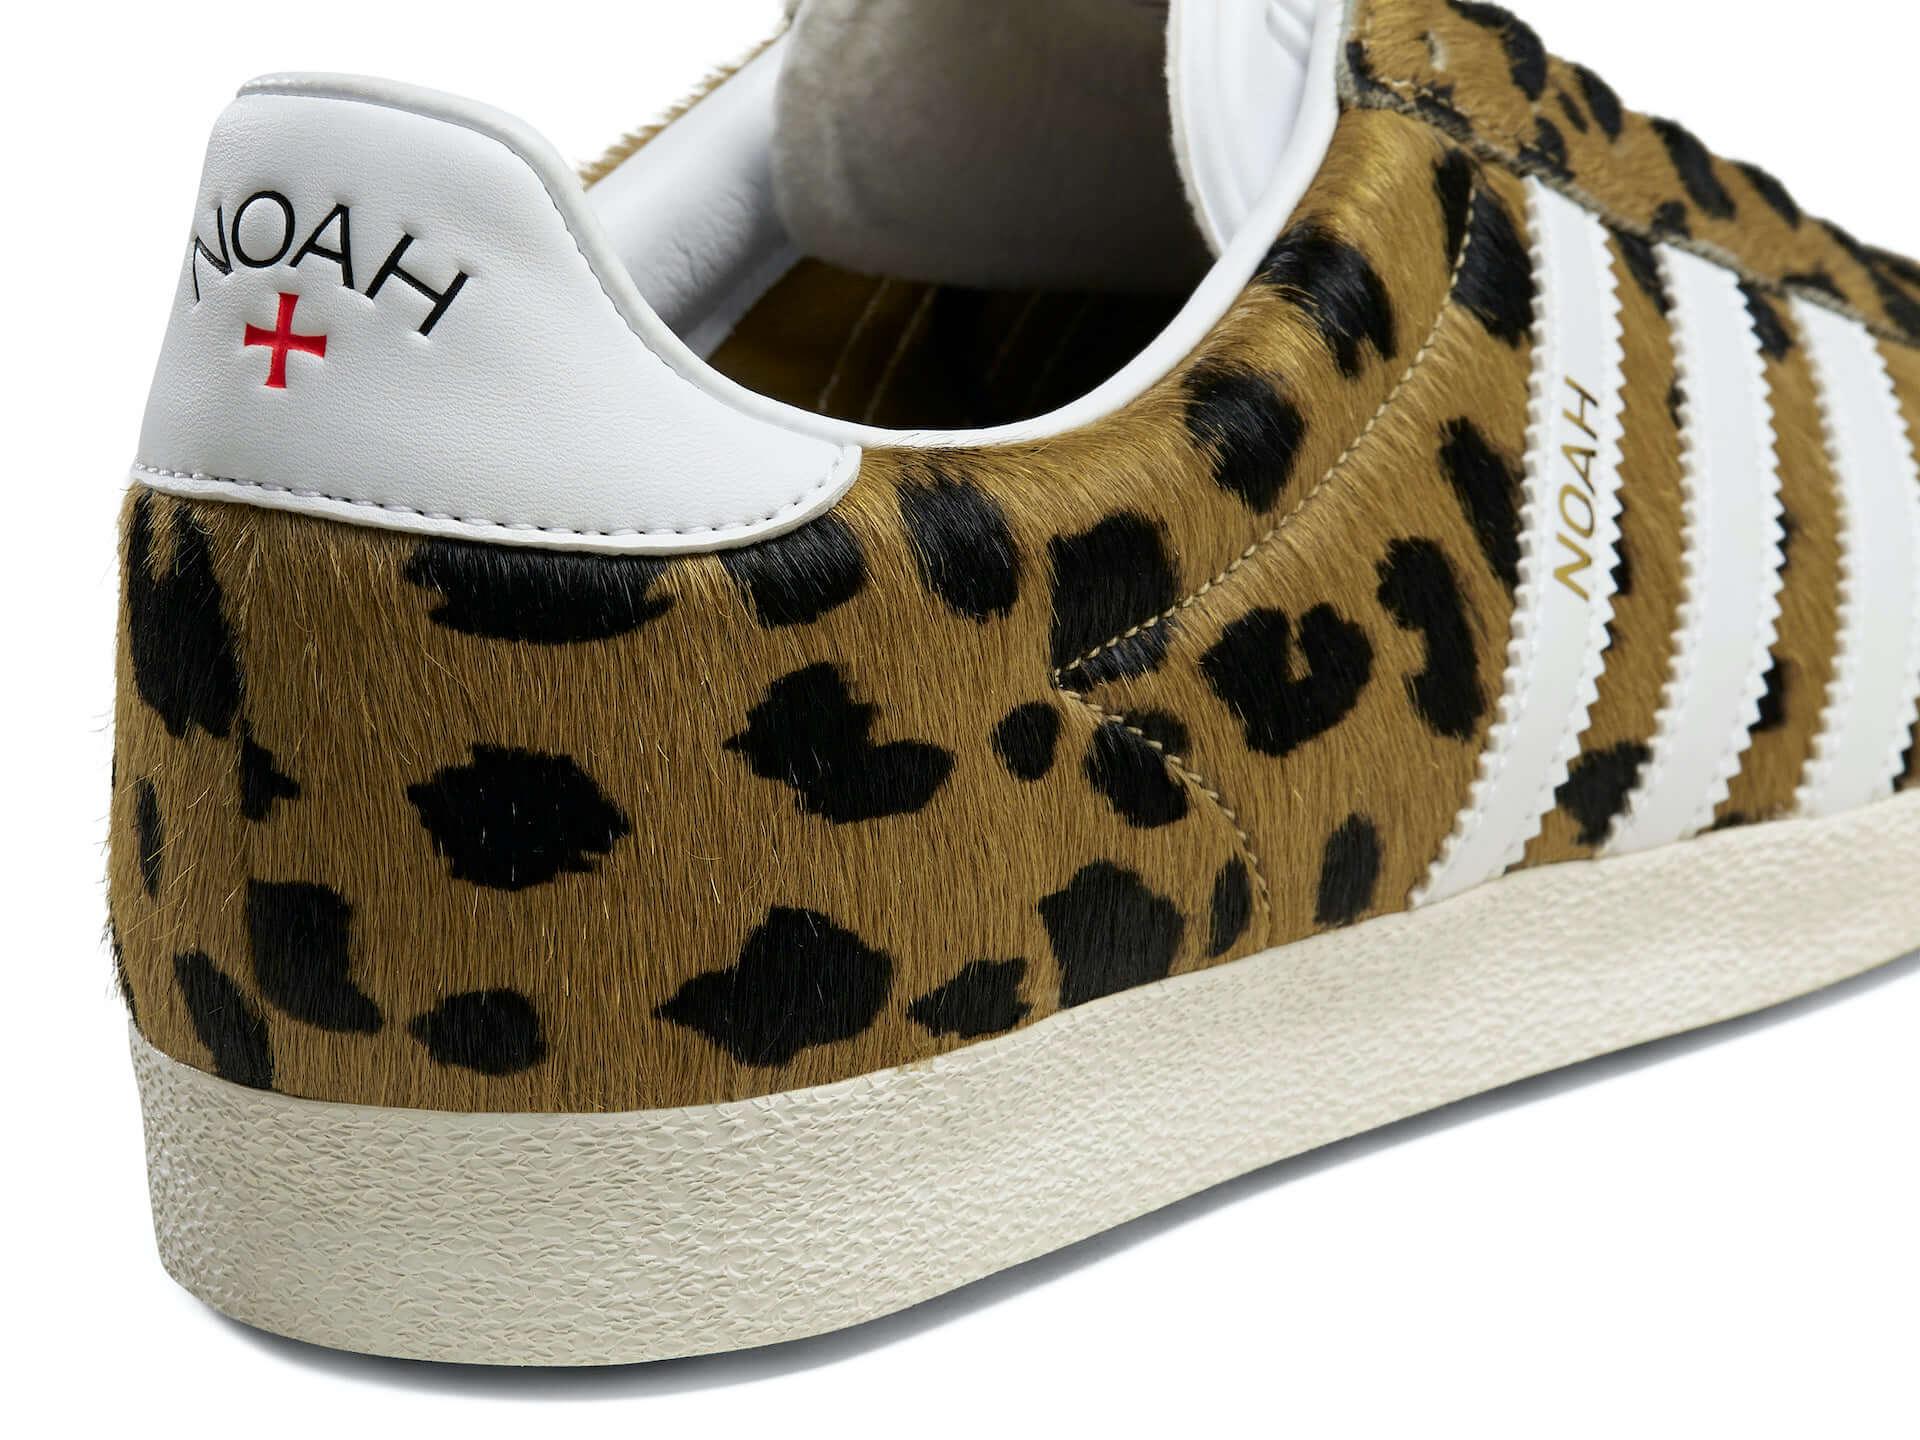 adidas OriginalsとNOAHによる2020年秋冬コラボシューズが登場!総柄モデル『GAZELLE OG』2種が明日発売 lf201202_adidas-noah_9-1920x1440